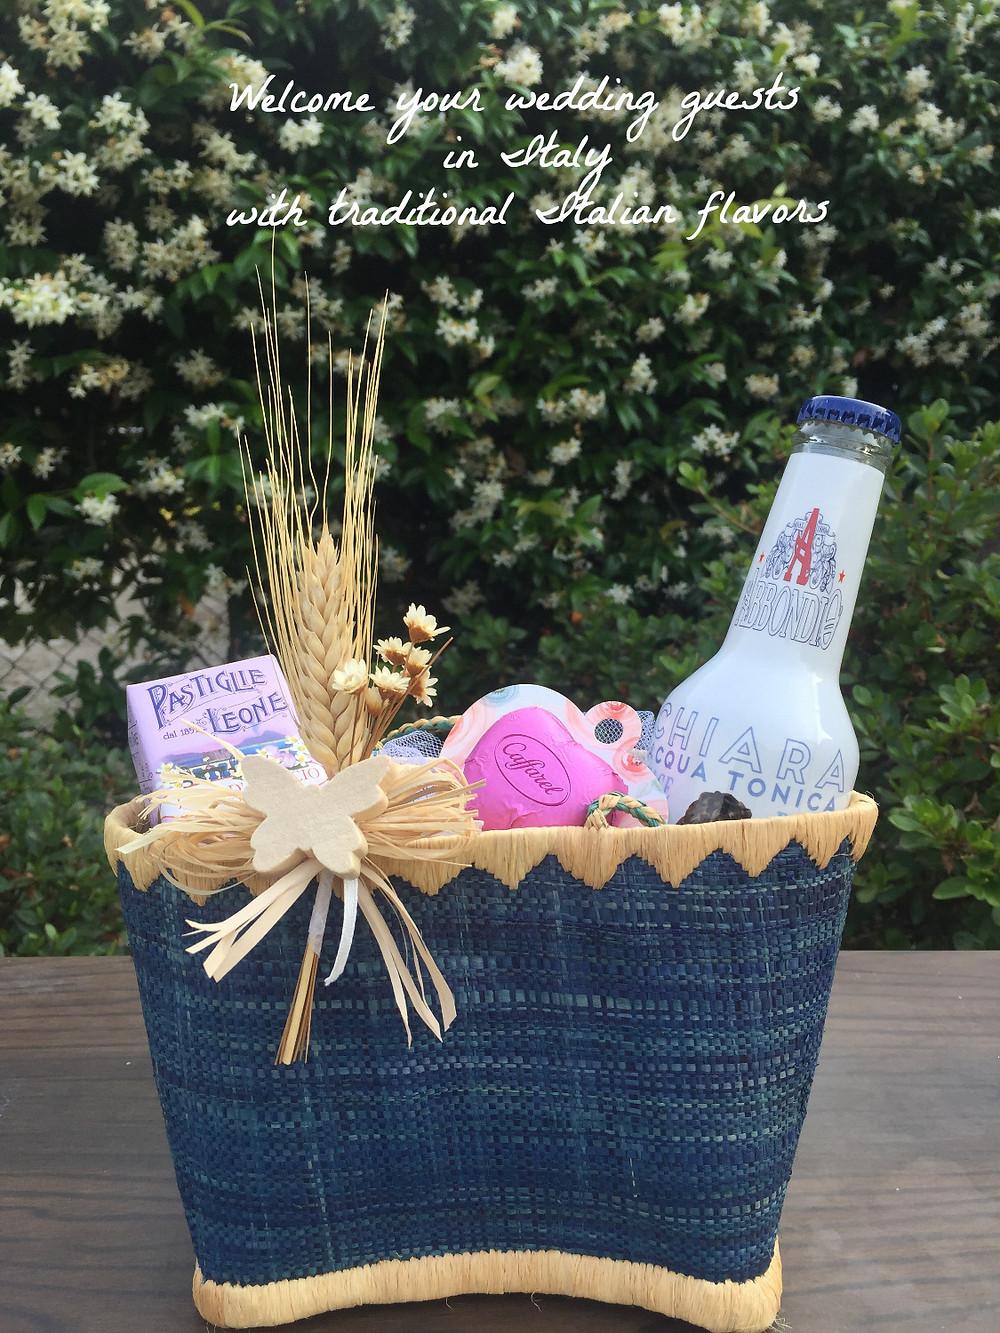 Wedding In Italy Ideas - Welcome Bag - Our Italian Fairytale